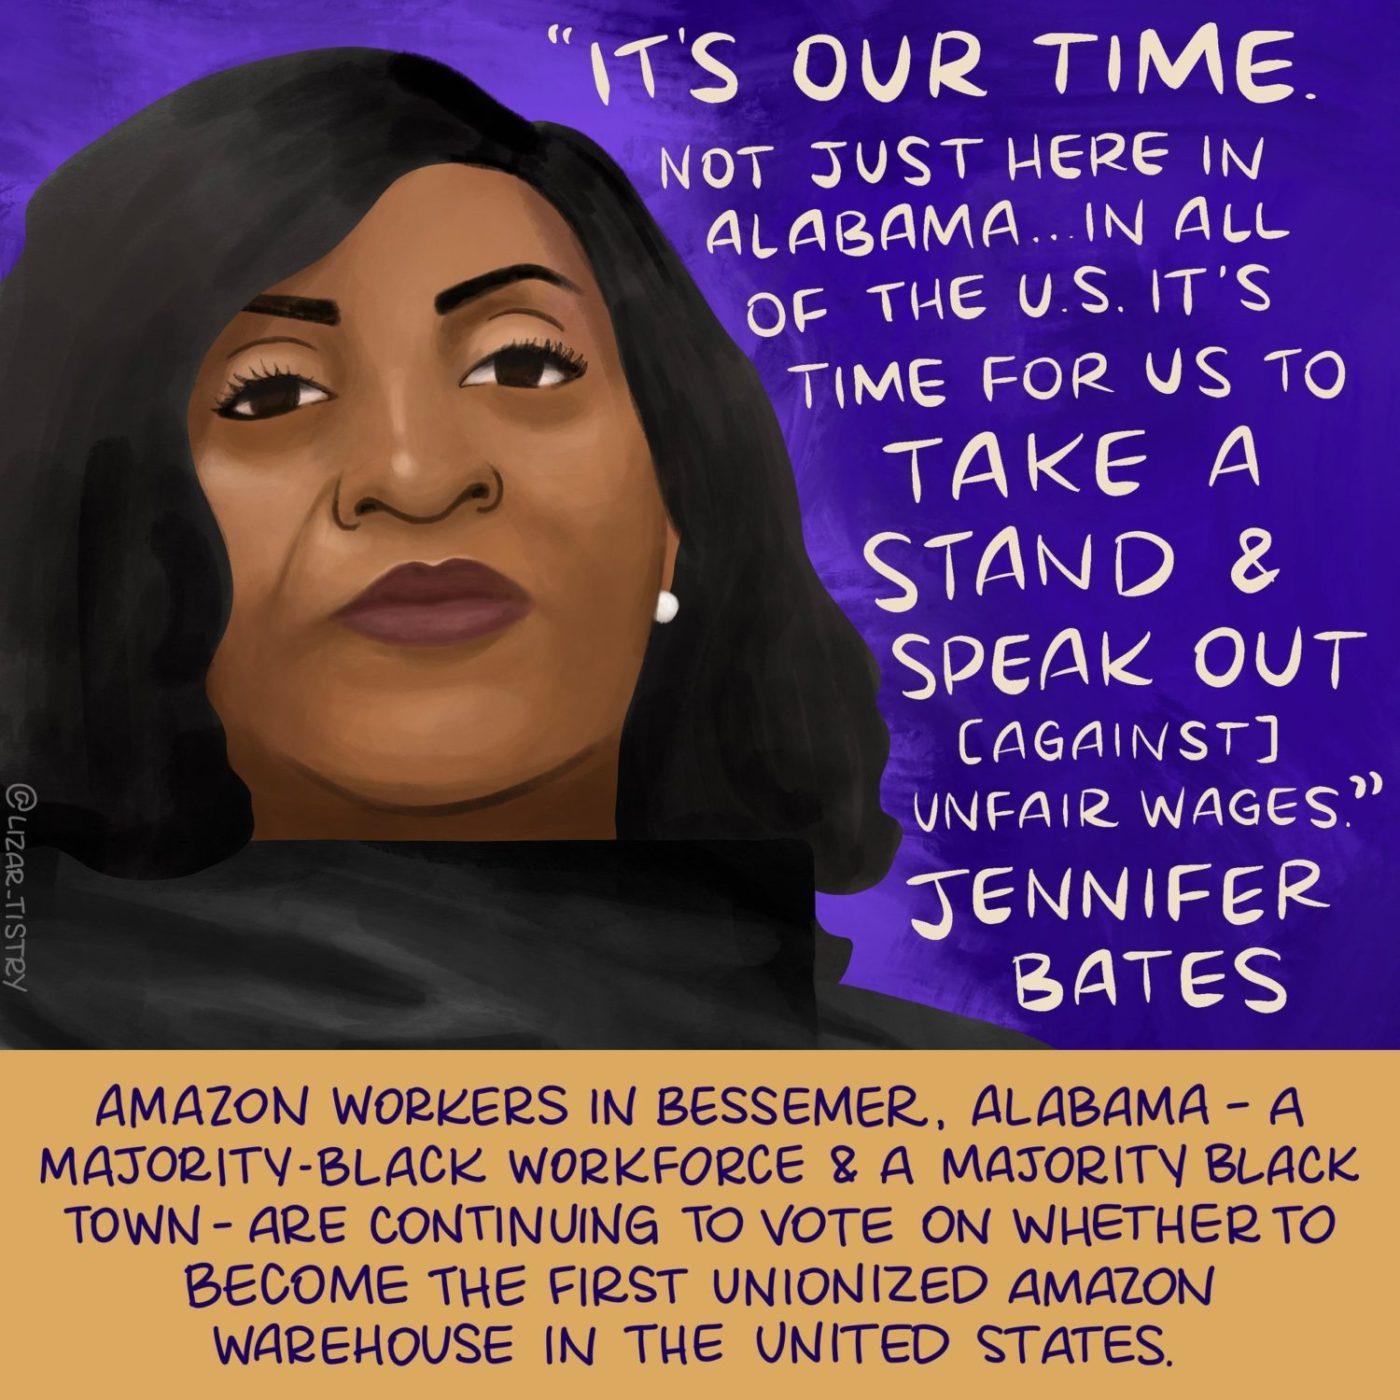 Amazon-organizer-Jennifer-Bates-Bessemer-Ala.-meme-Its-Our-Time-0321-1400x1400, Black workers lead union movement at Amazon, National News & Views